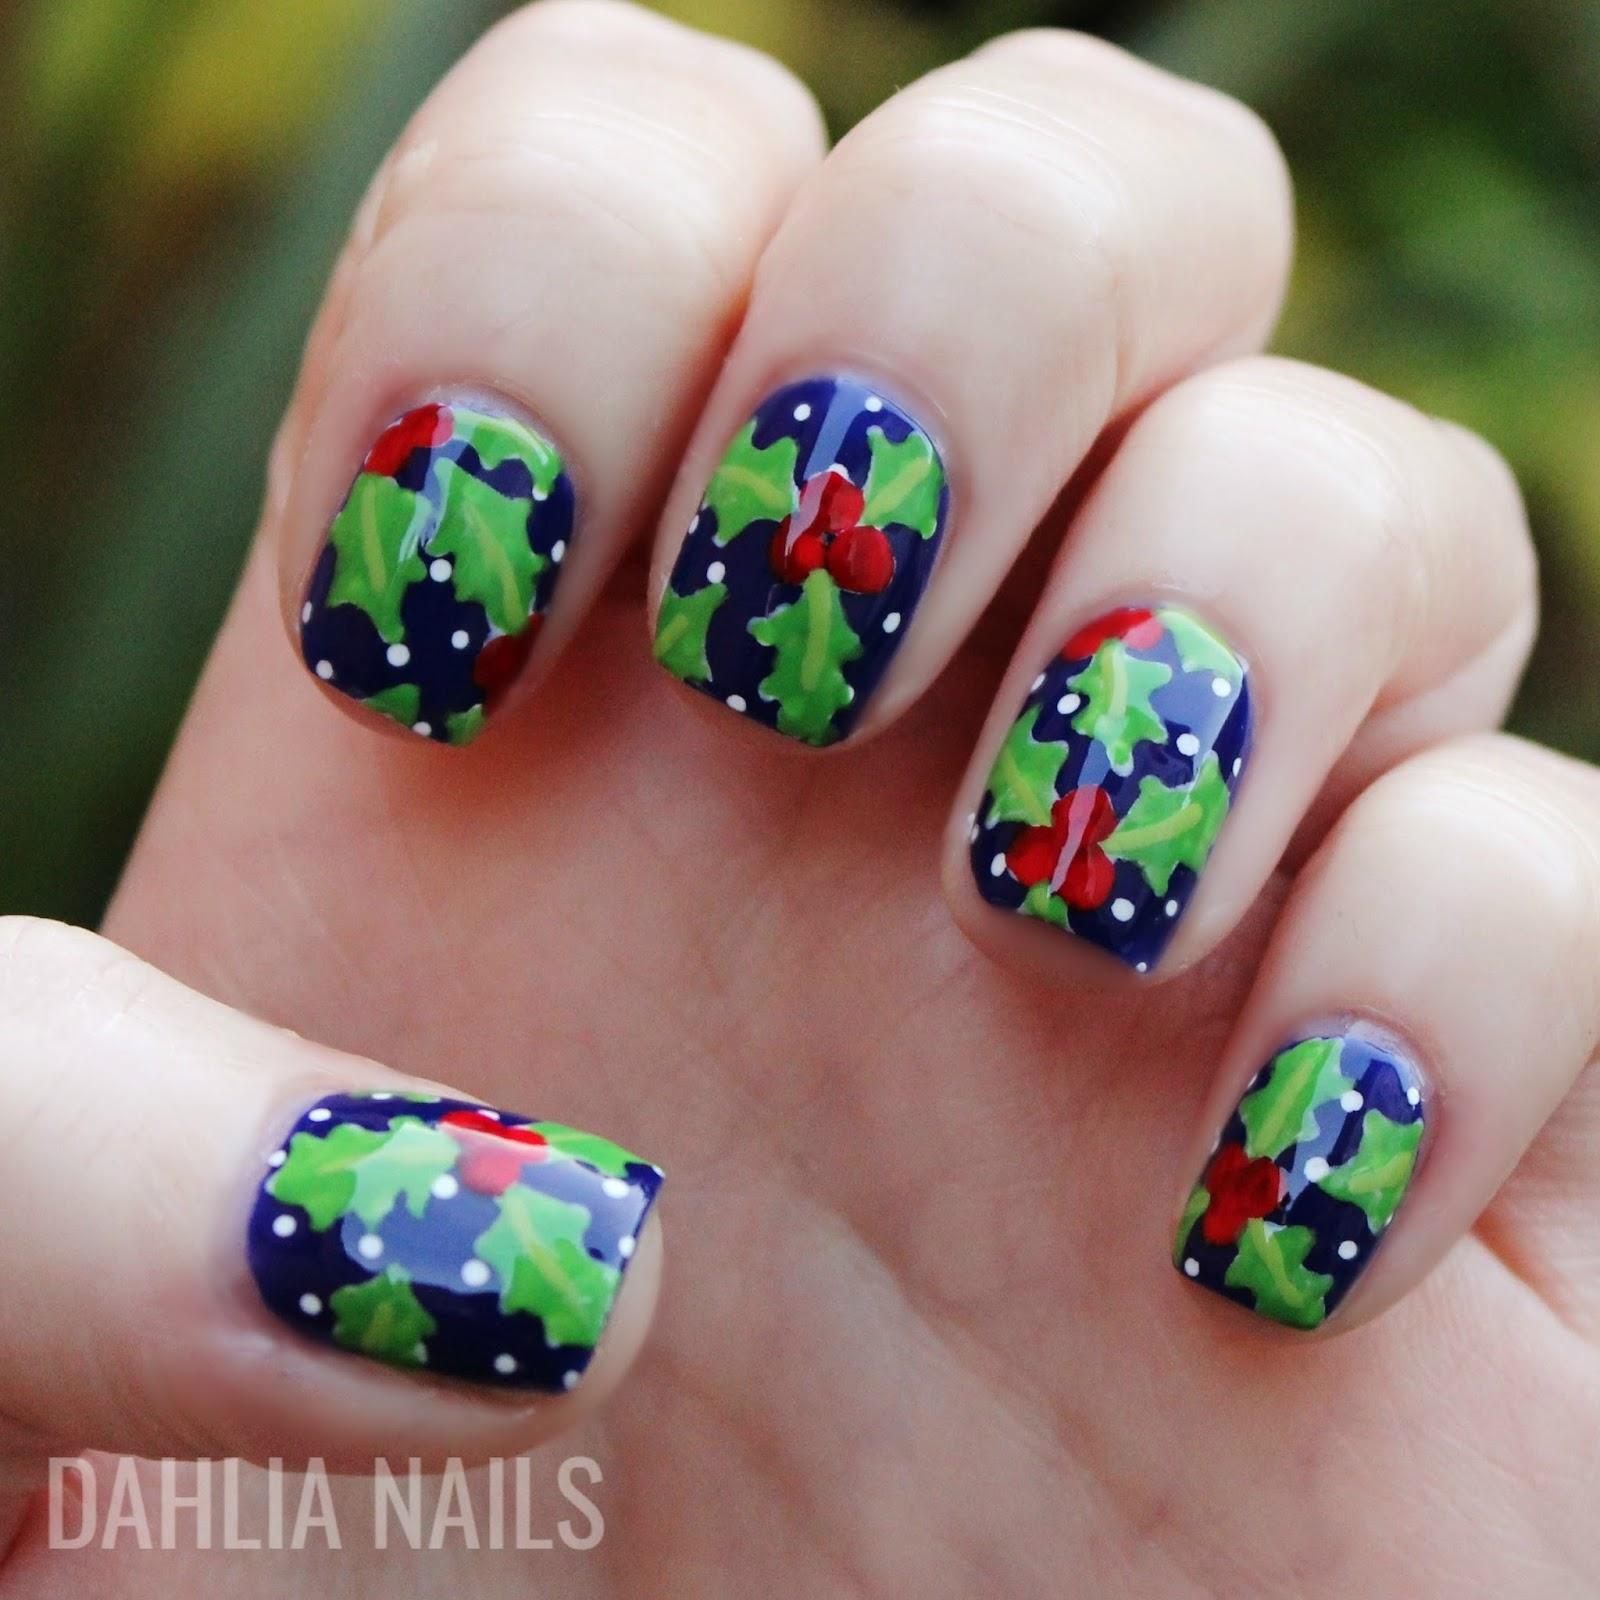 Dahlia Nails: Happy Christmas Eve!